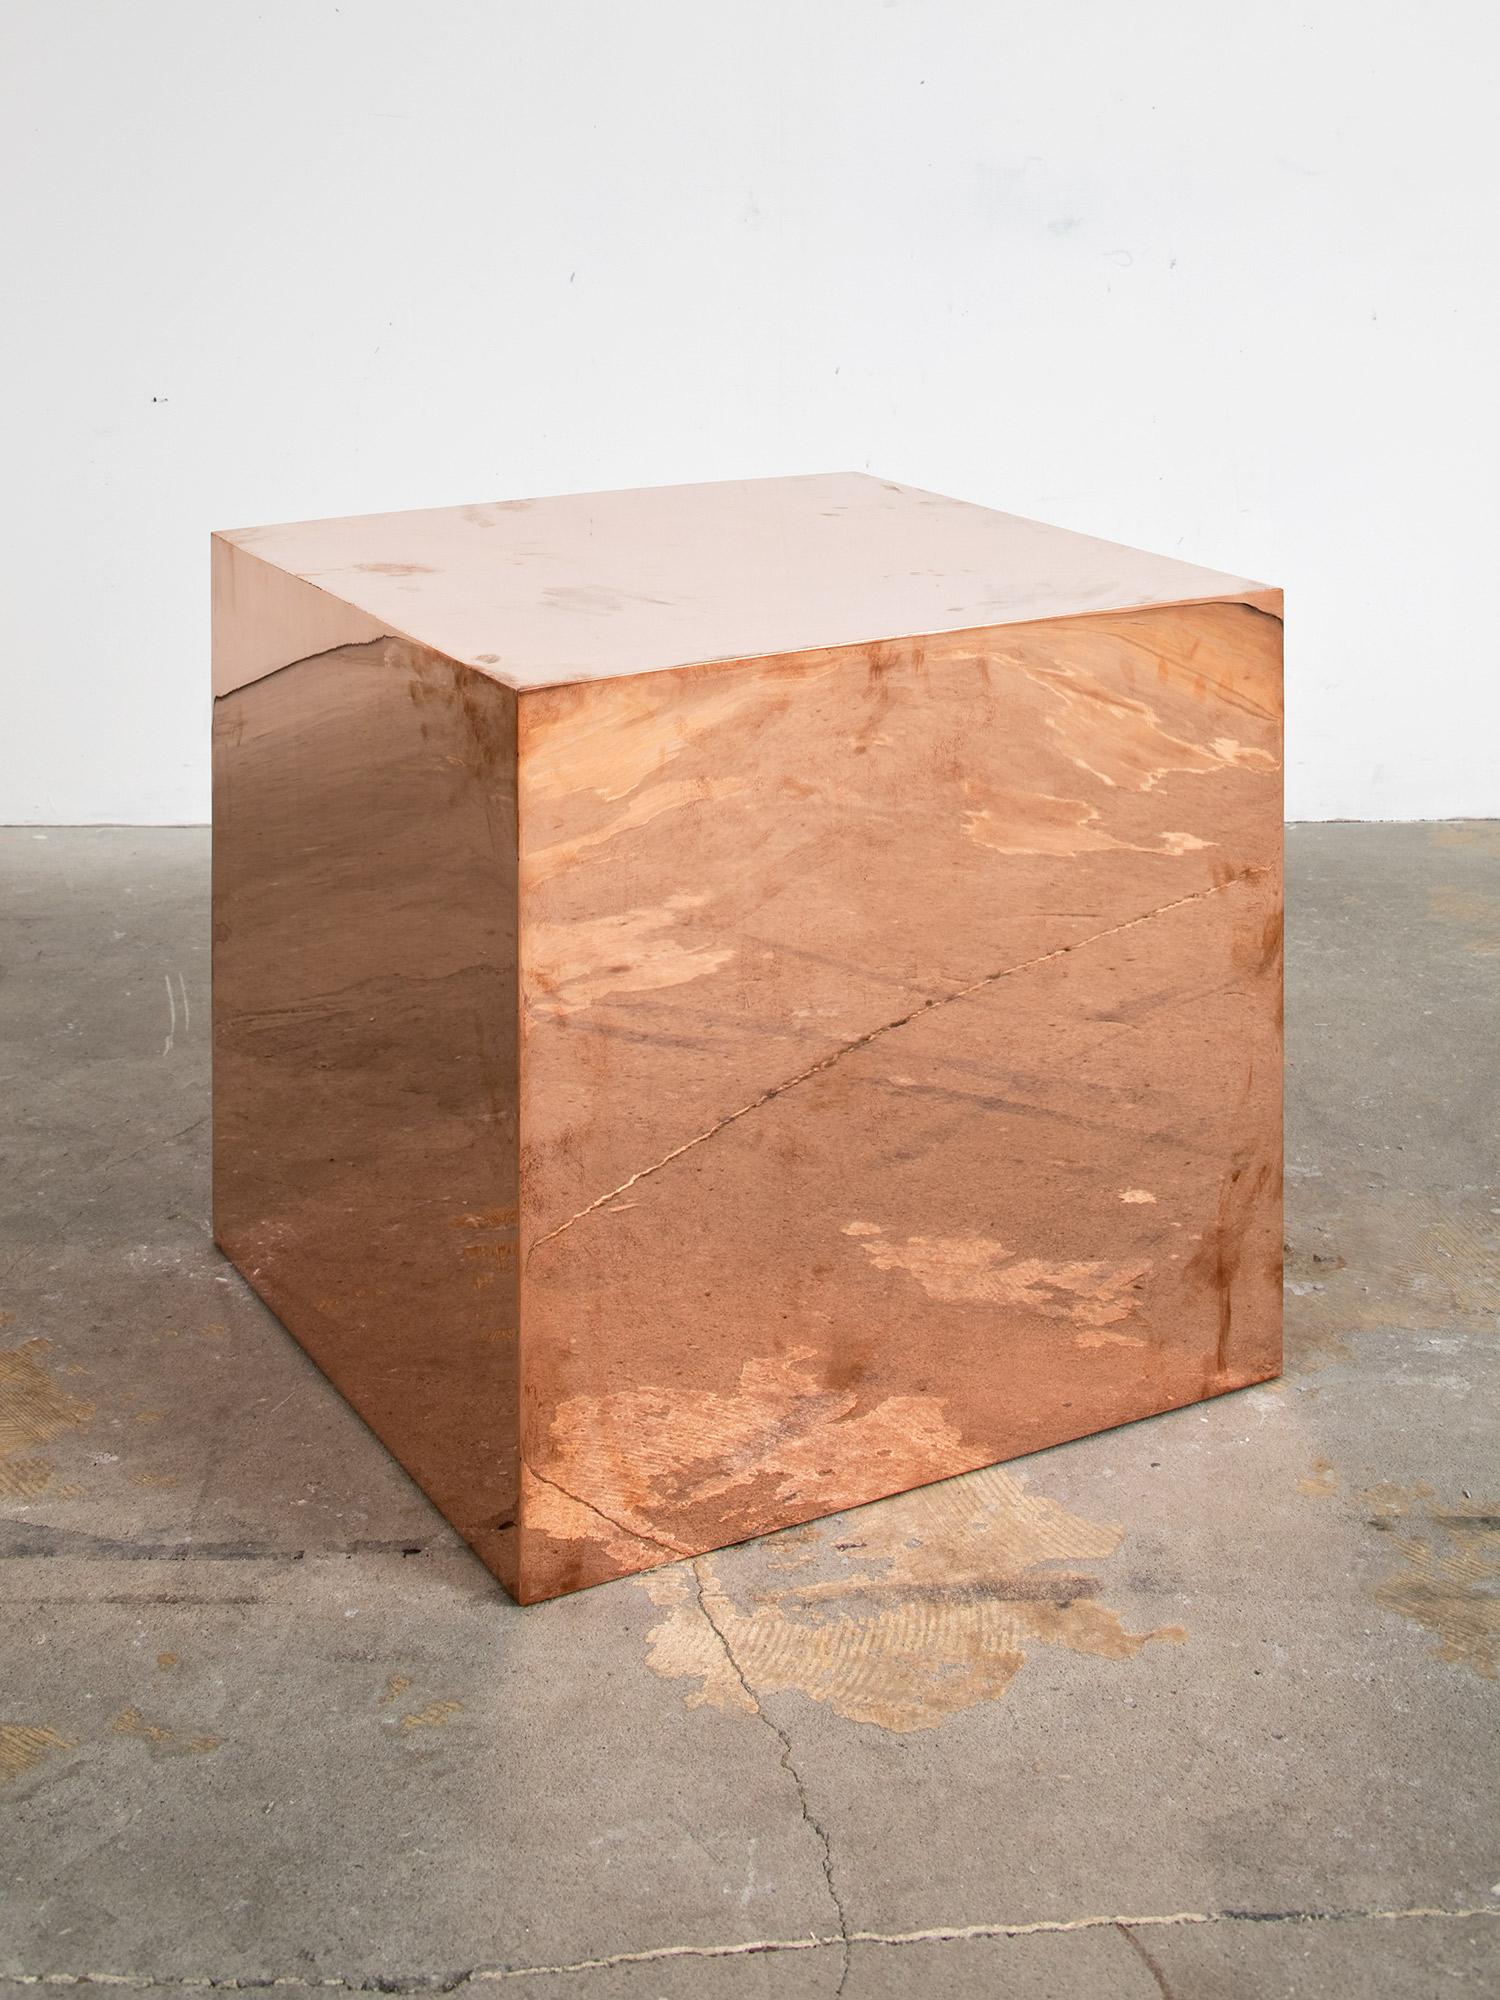 24-inch Copper (FedEx® Large Kraft Box  © 2008 FEDEX 330510 REV 6/08 GP), International Priority, Los Angeles–Malmö trk#794379965566, February 2–4, 2011, International Priority, Malmö–Mostolés trk#871976834313, June 10–13, 2011, International Priority, Mostolés–Los Angeles trk#797697675646, November 3–8, 2011    2011–   Polished copper, accrued FedEx shipping, and tracking labels  24 x 24 x 24 inches   FedEx Copper Works, 2009–